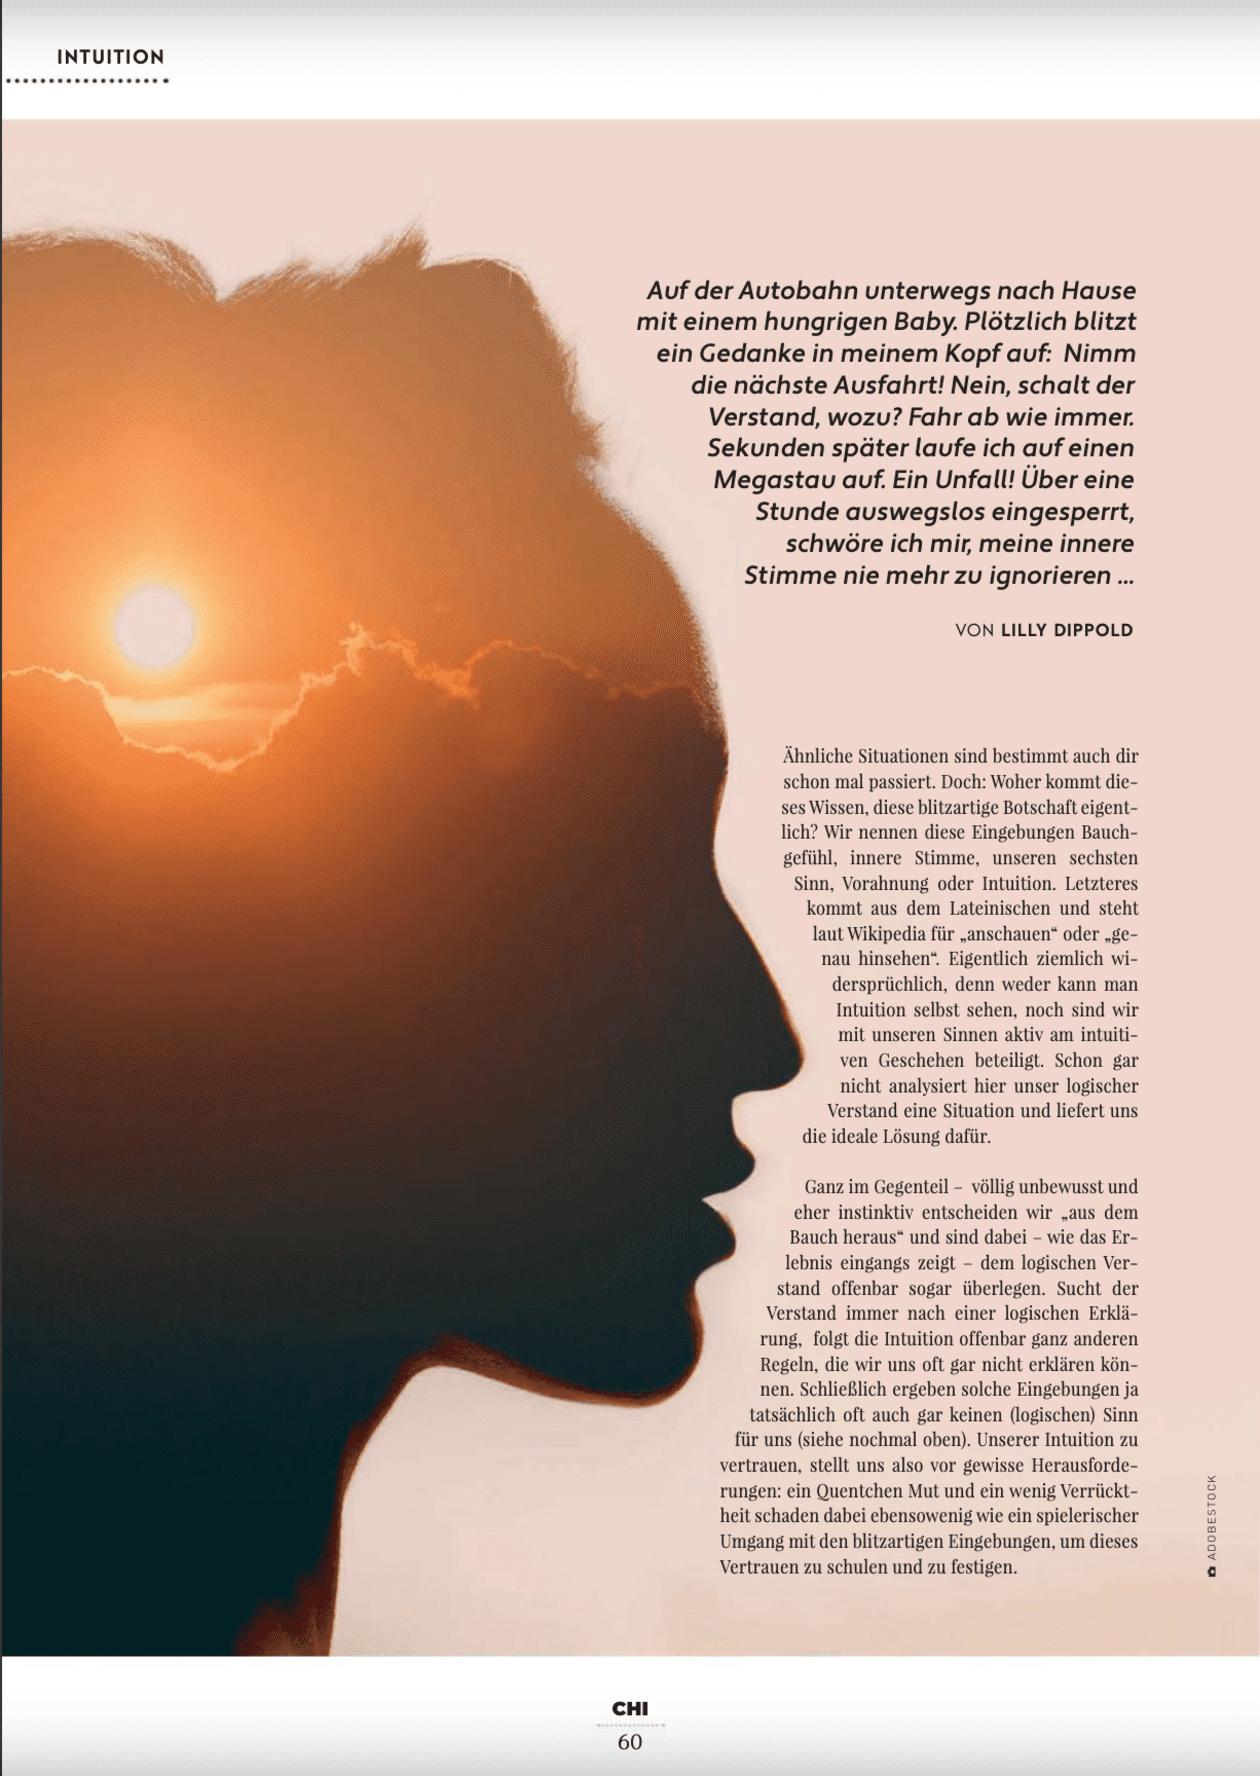 Chi-Magazin-Interview-Intuition-Corinna-Maria-Pfitzer-1